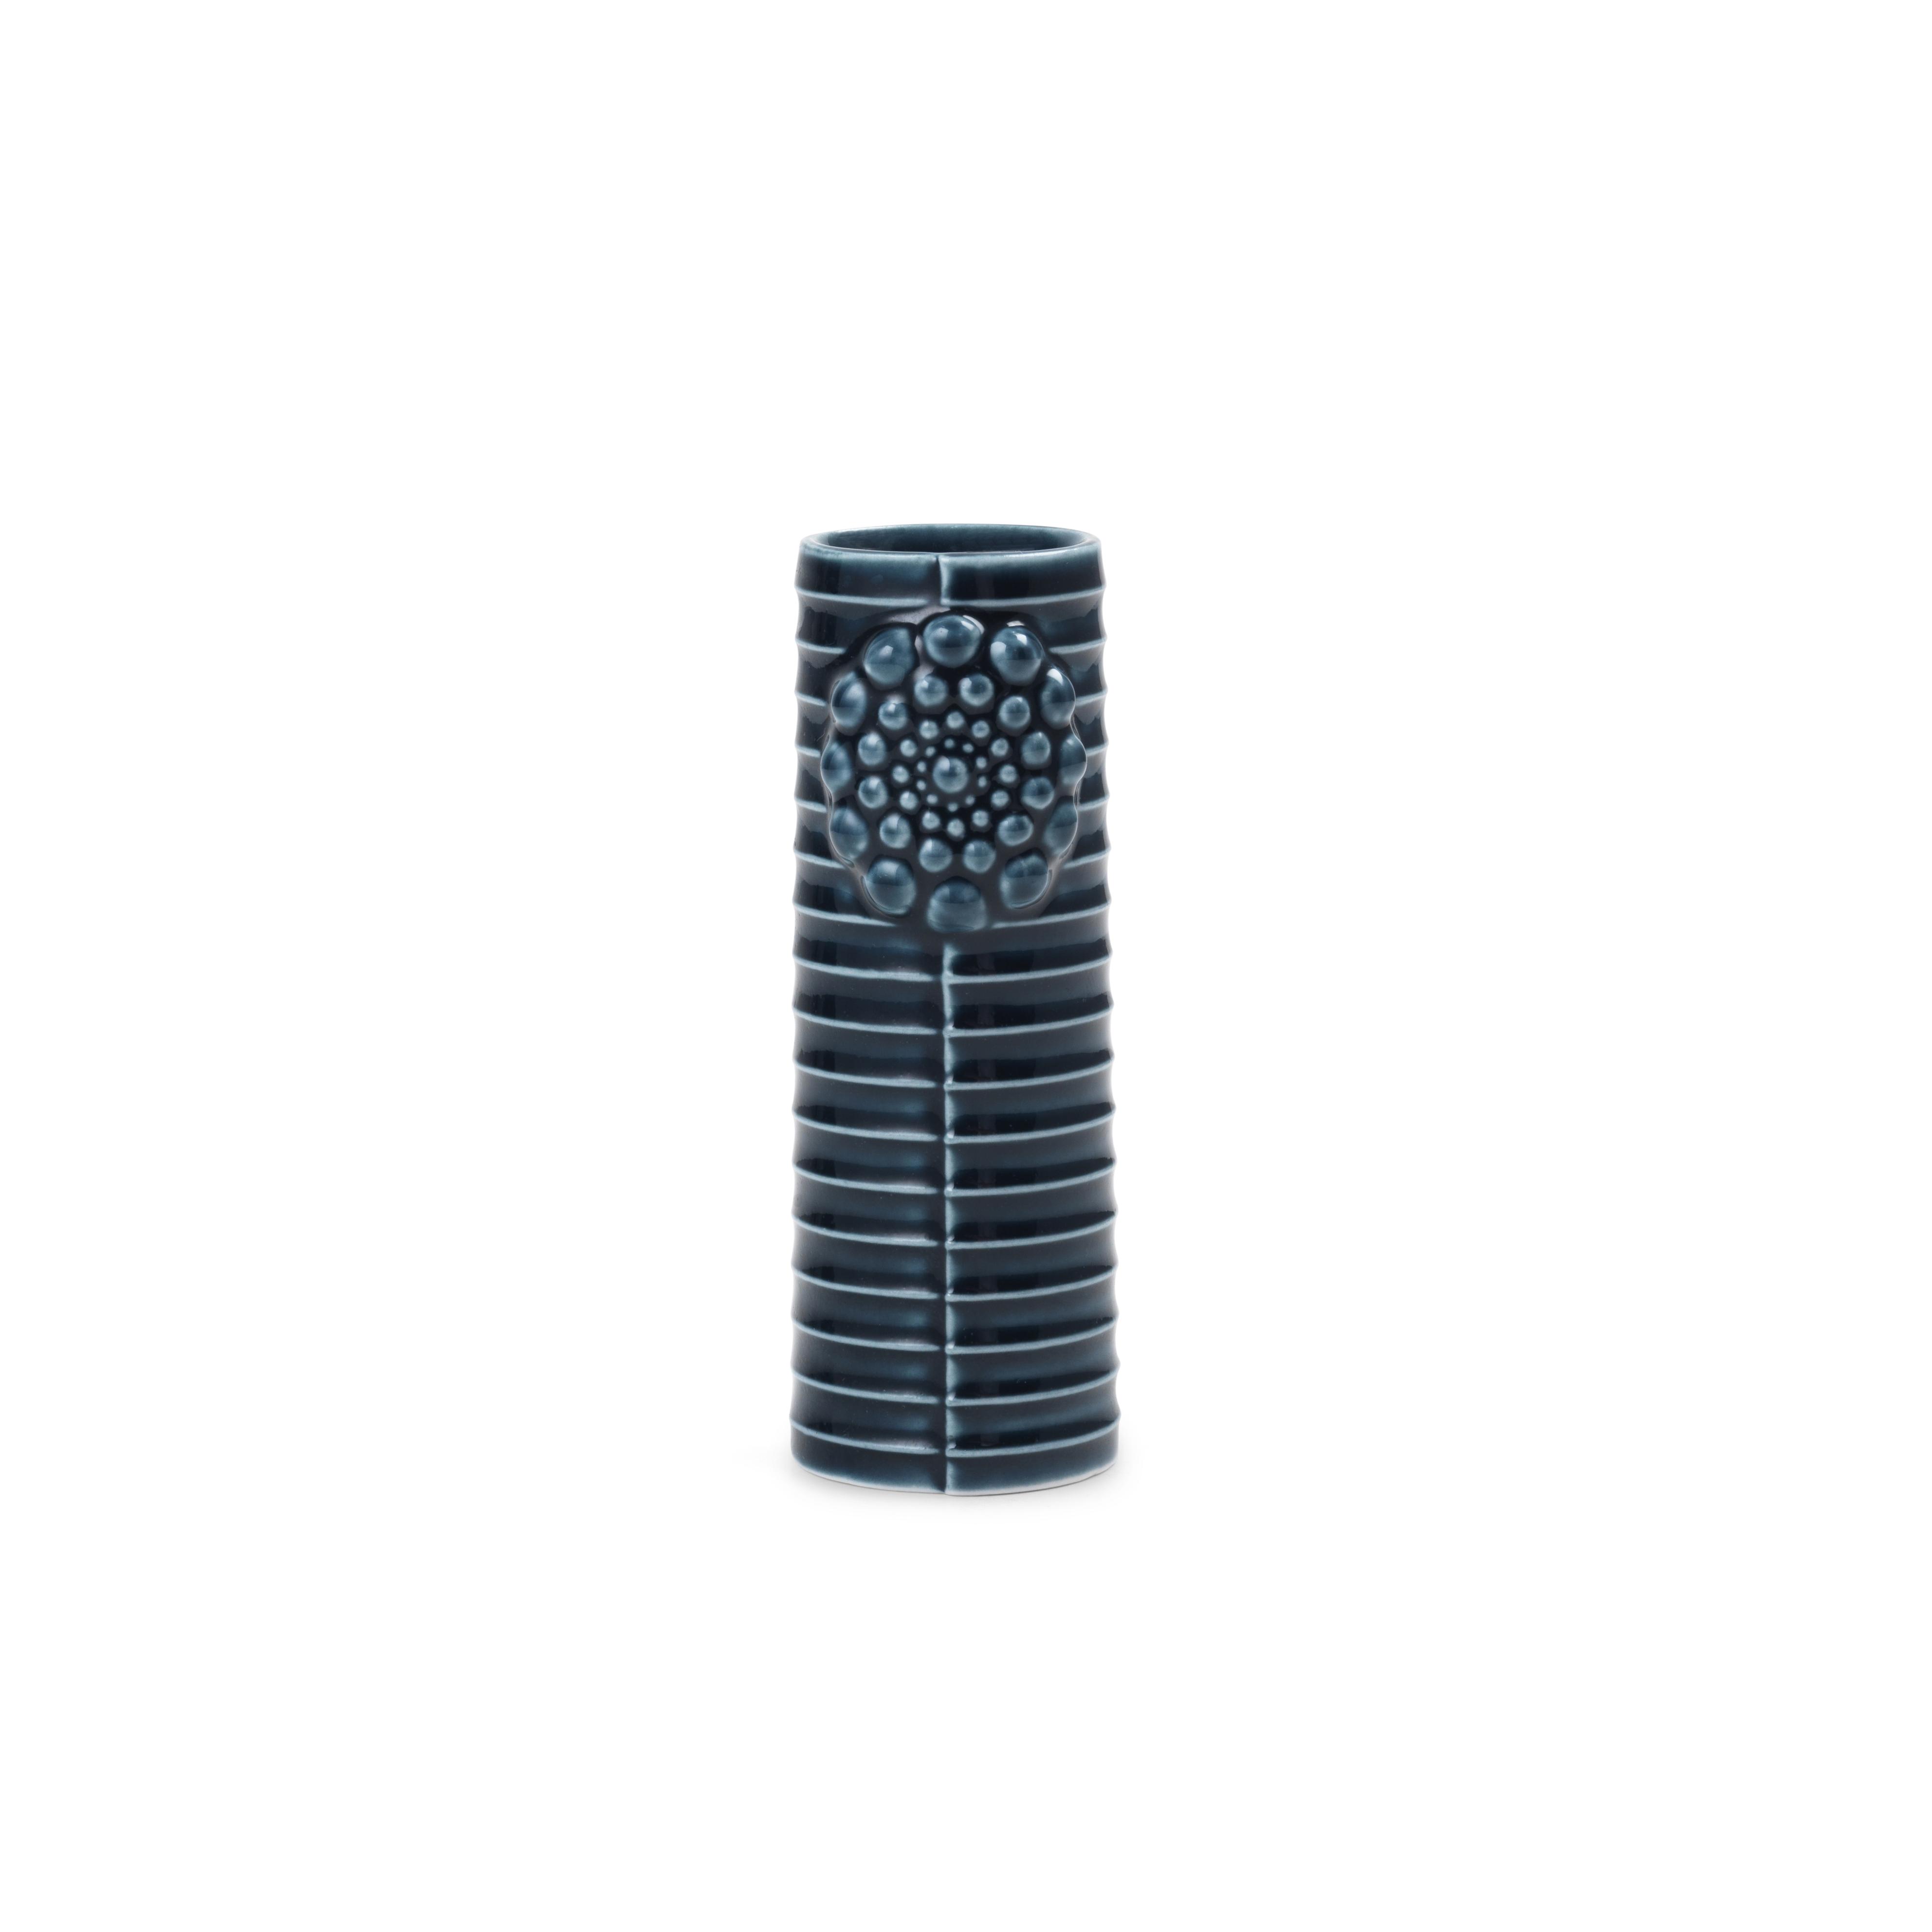 DOTTIR Pipanella Lines vase, micro, petrol